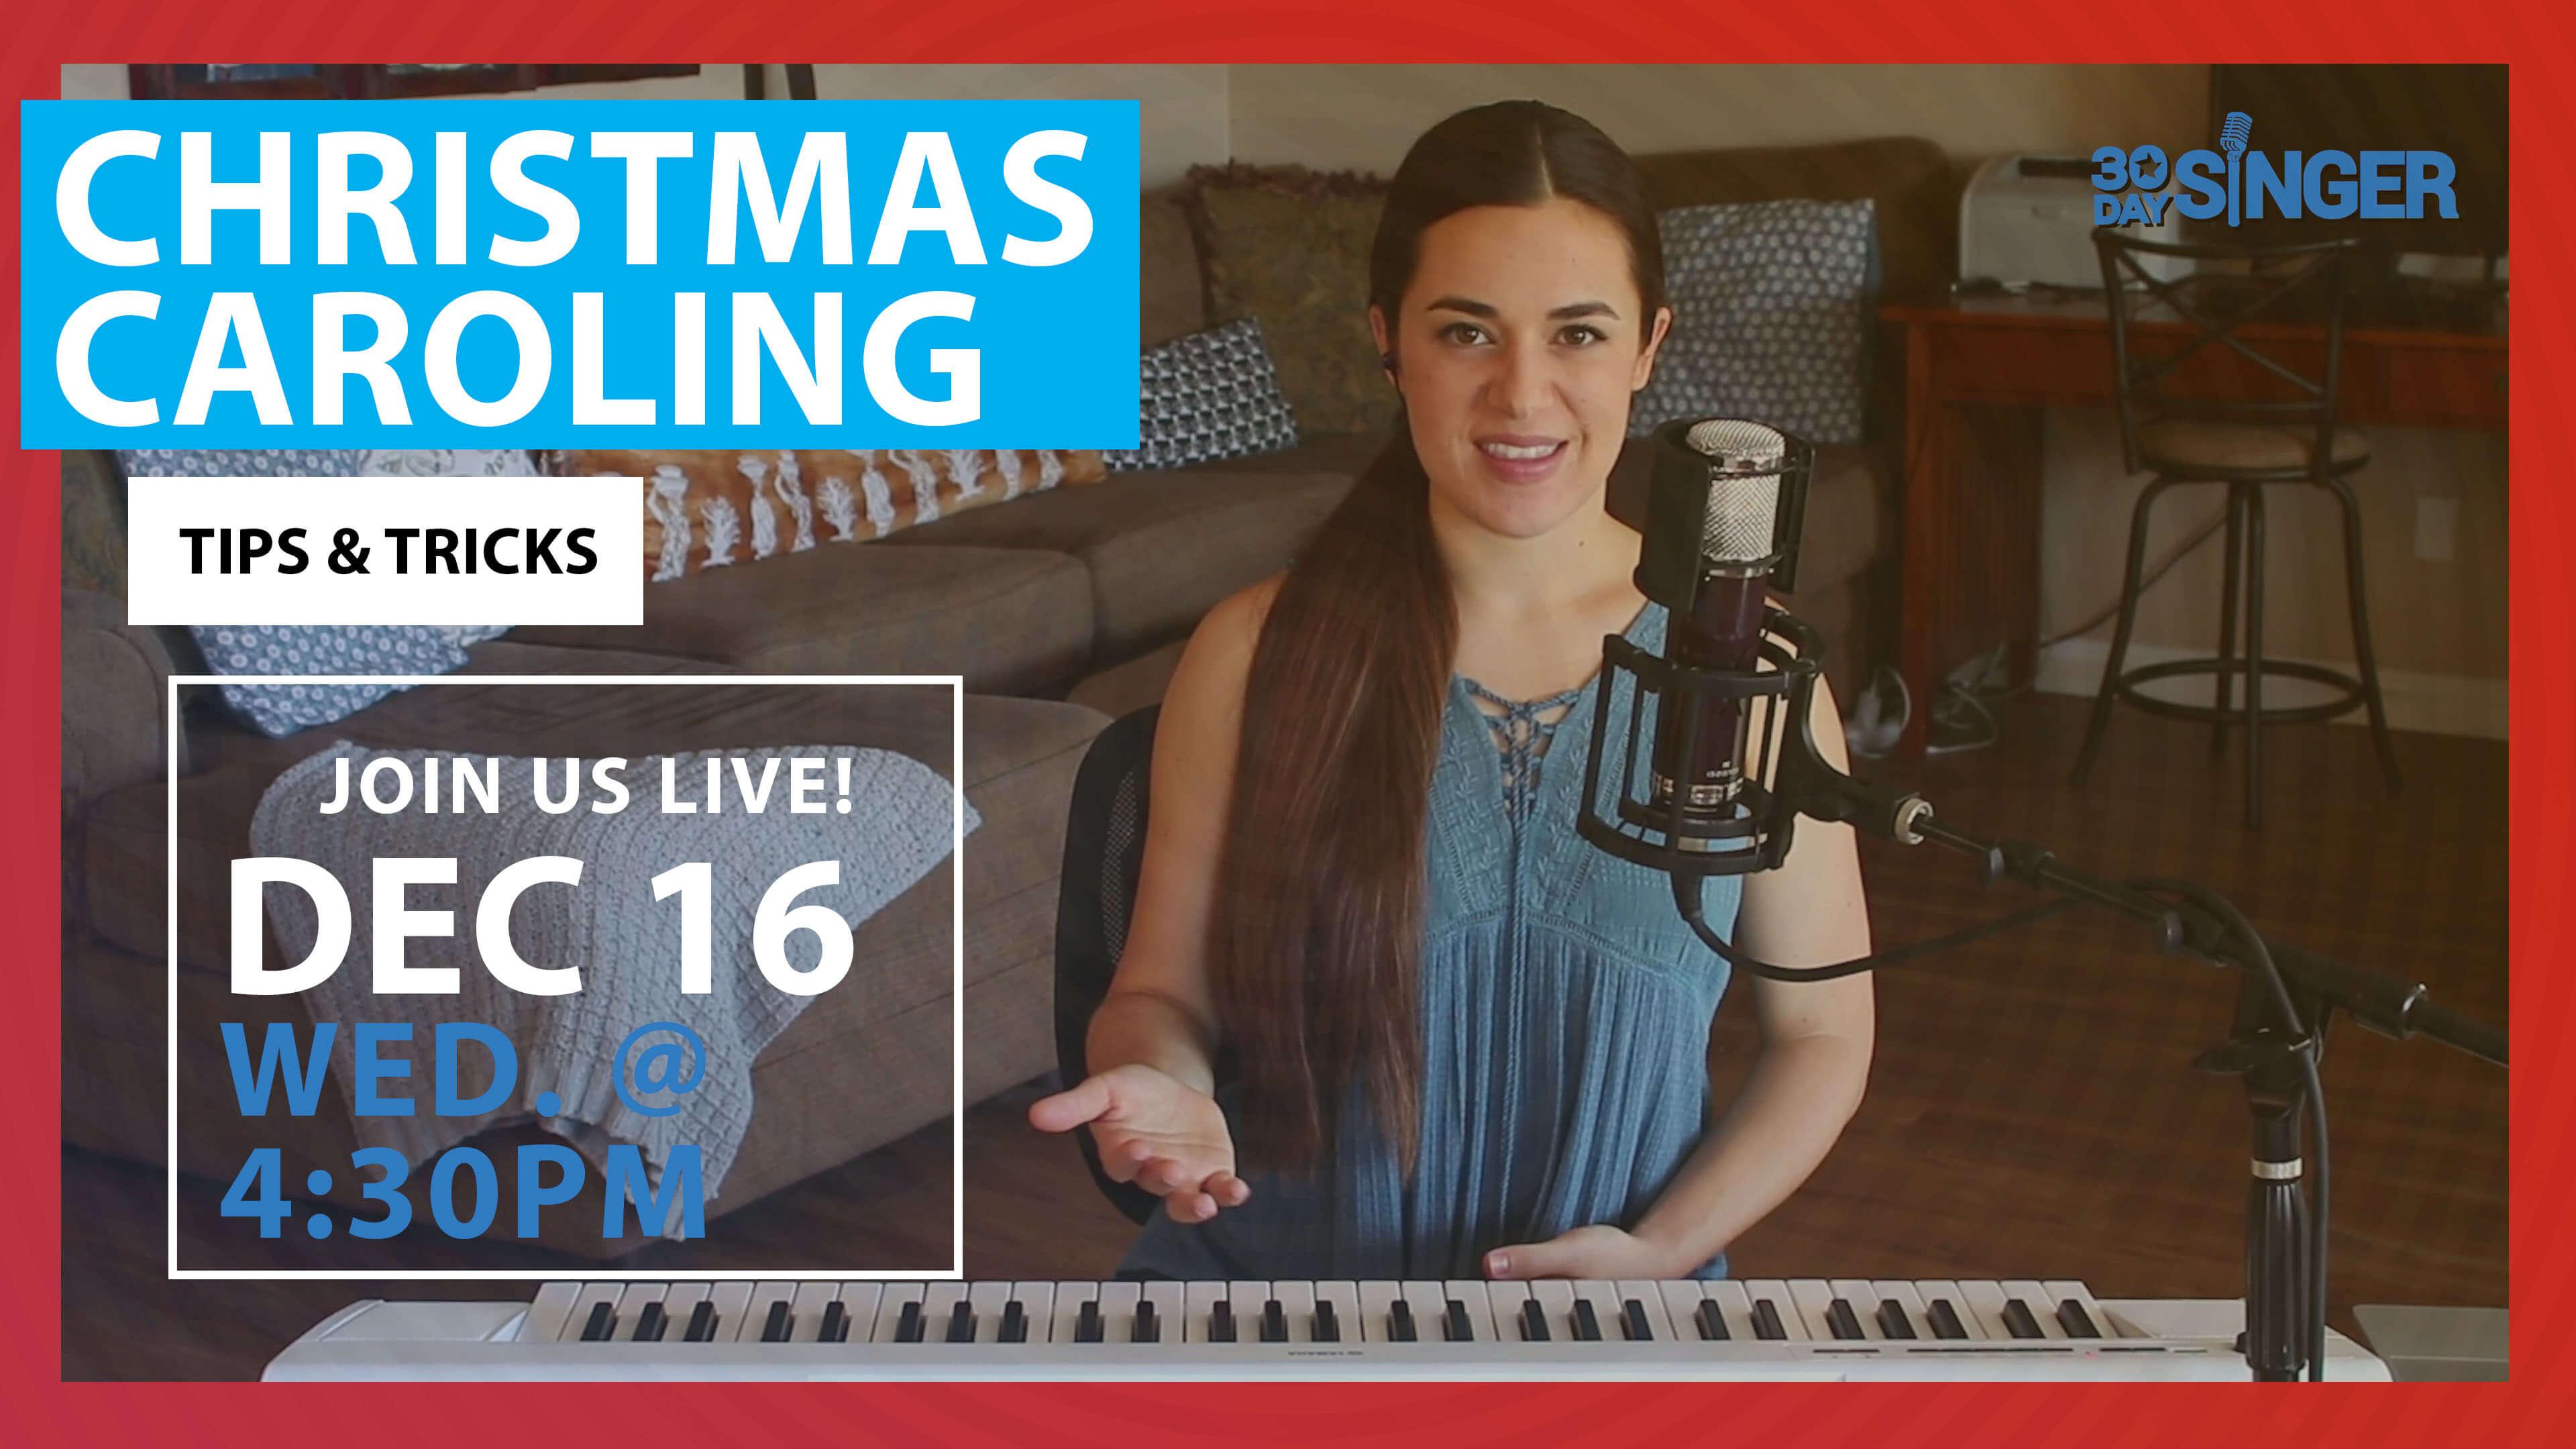 Christmas Caroling Made Easy For Beginners